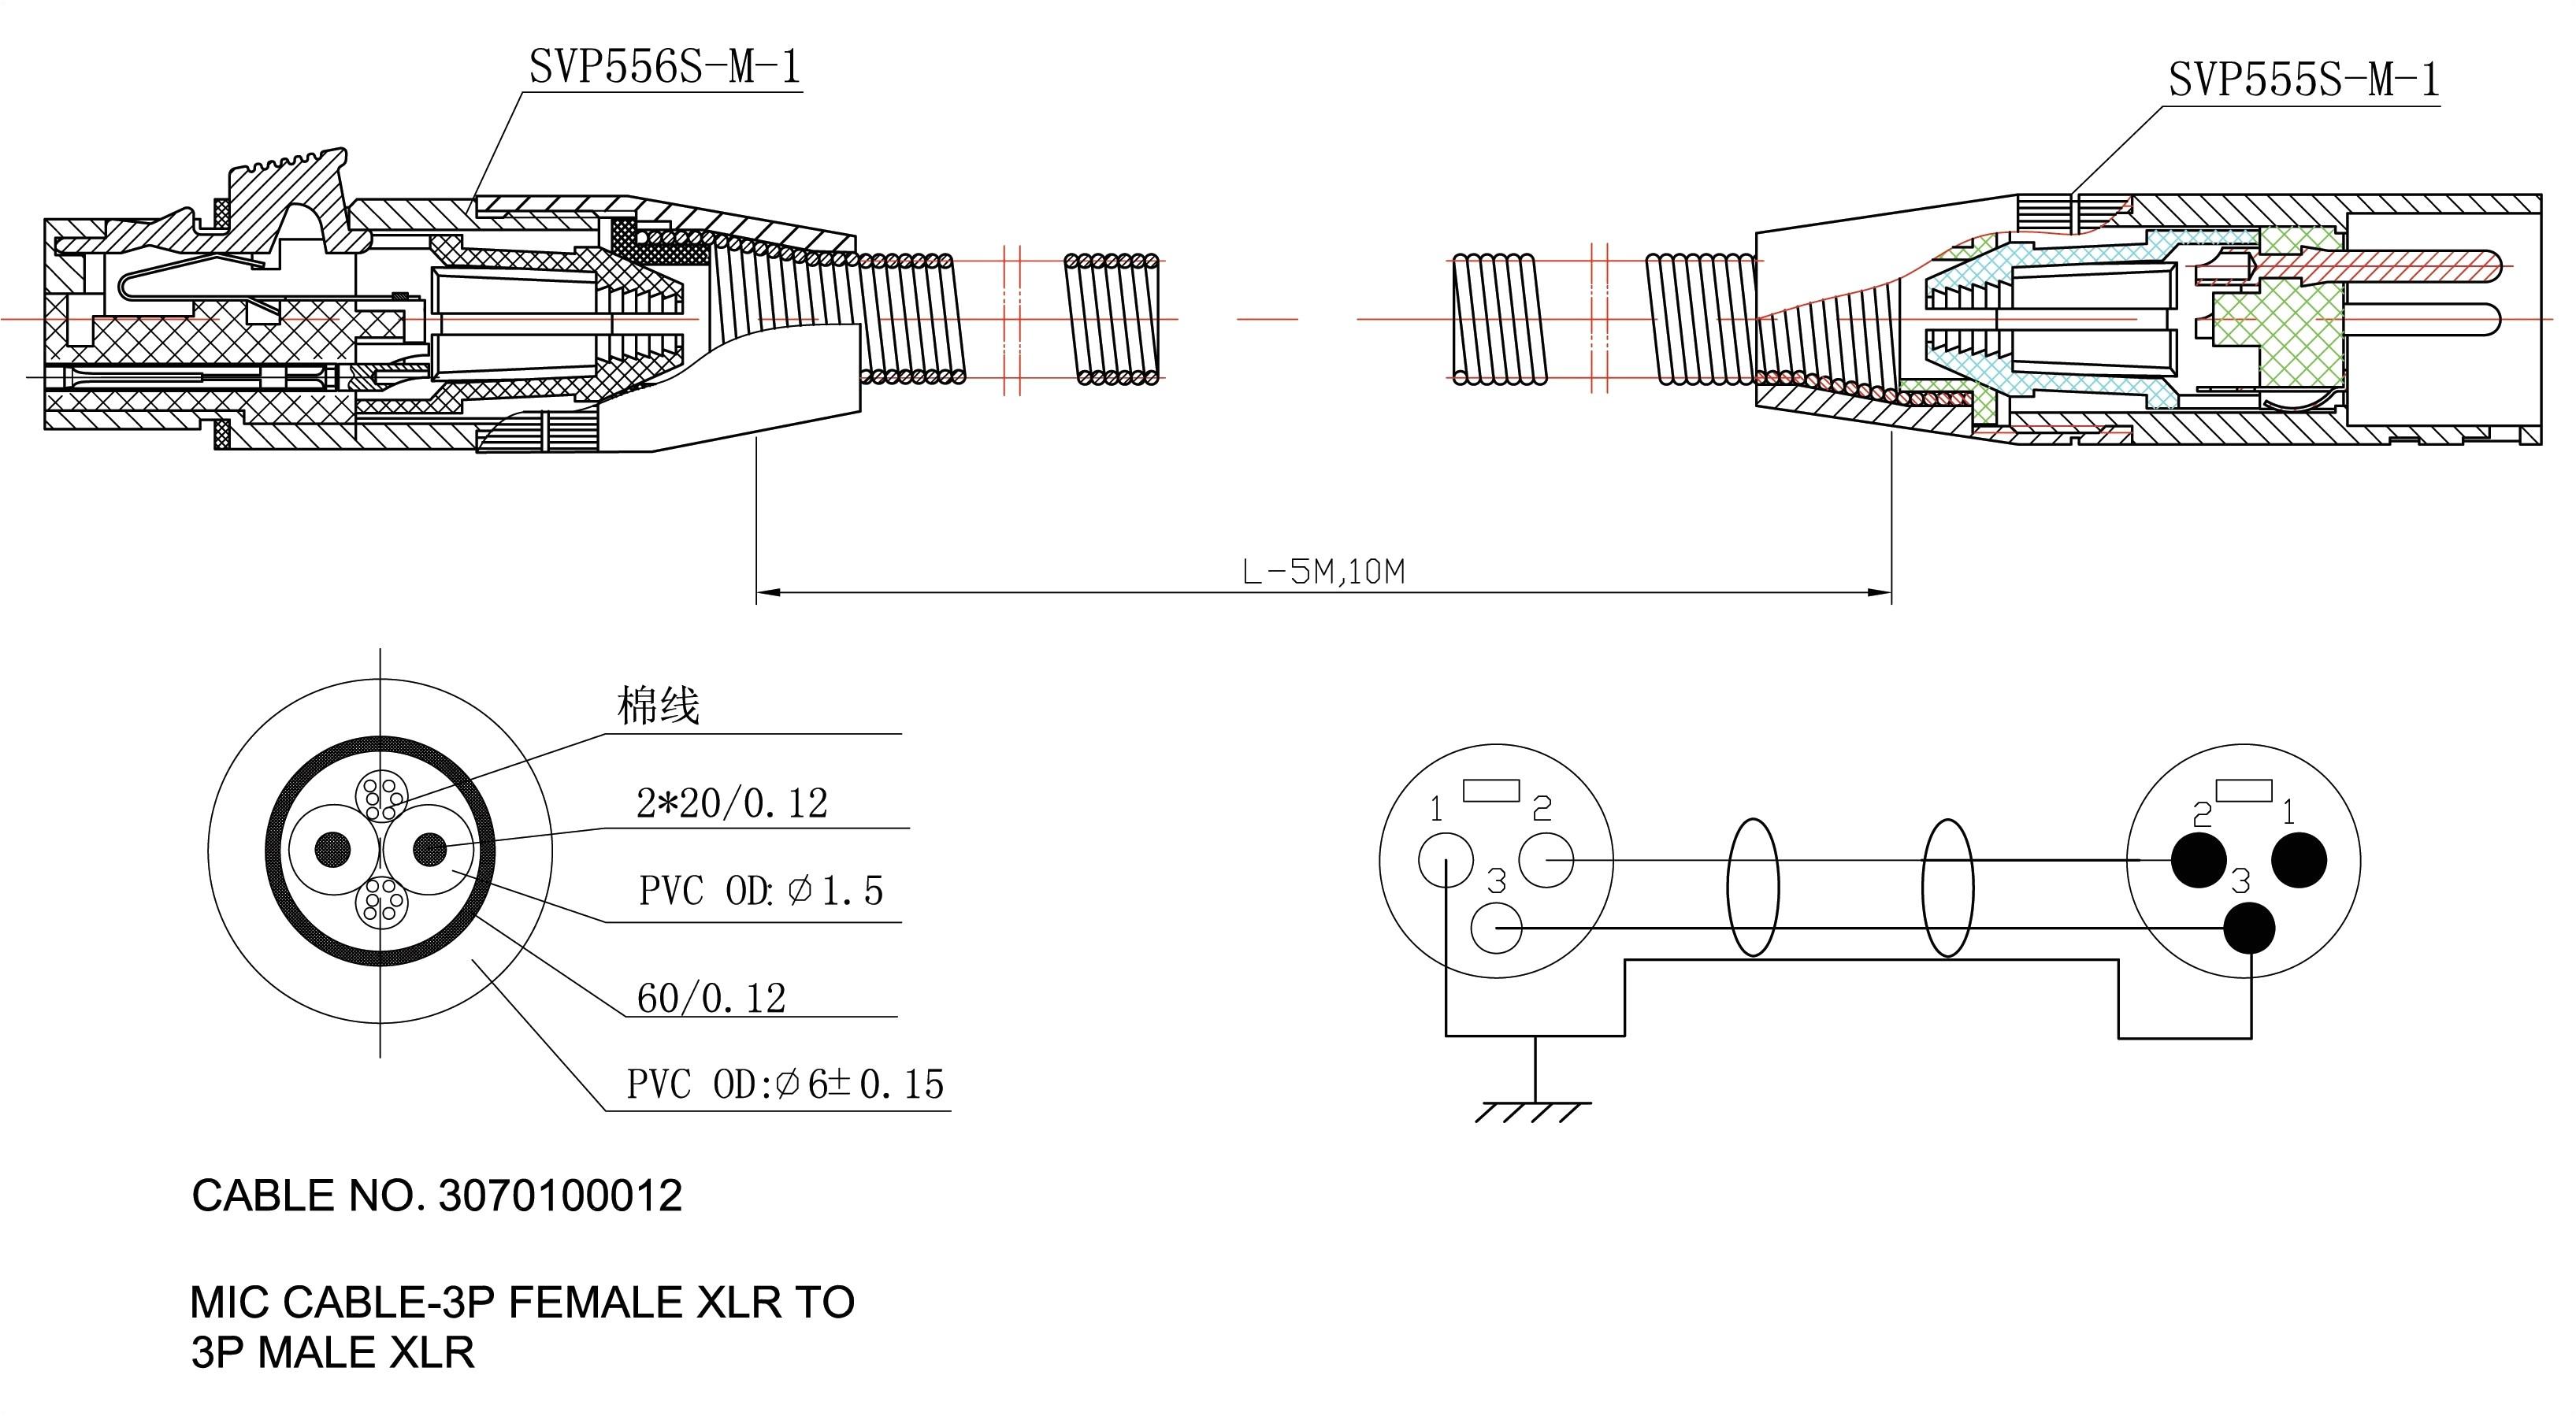 luxury rj45 wall socket wiring diagram cloudmining promo net rj45 to bt plug wiring diagram